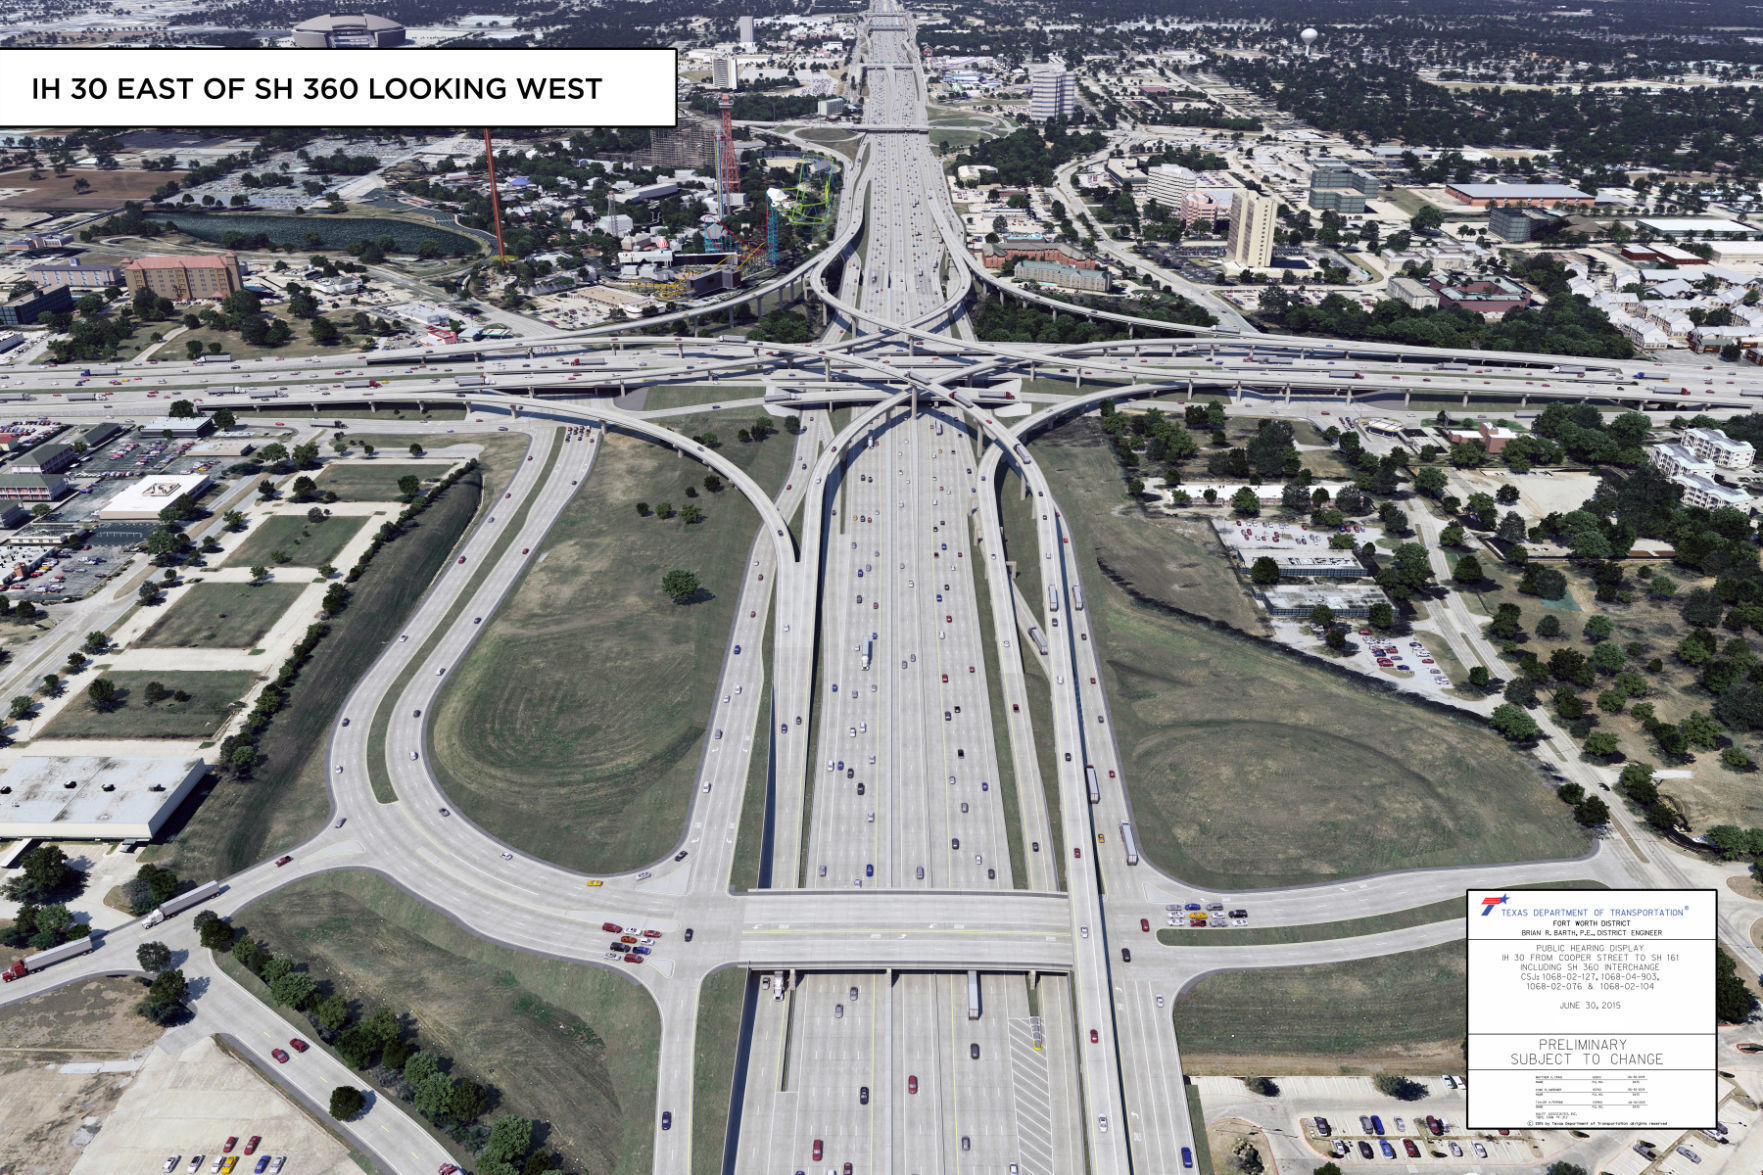 Lamar Boulevard, Park Row Drive closes this week for construction